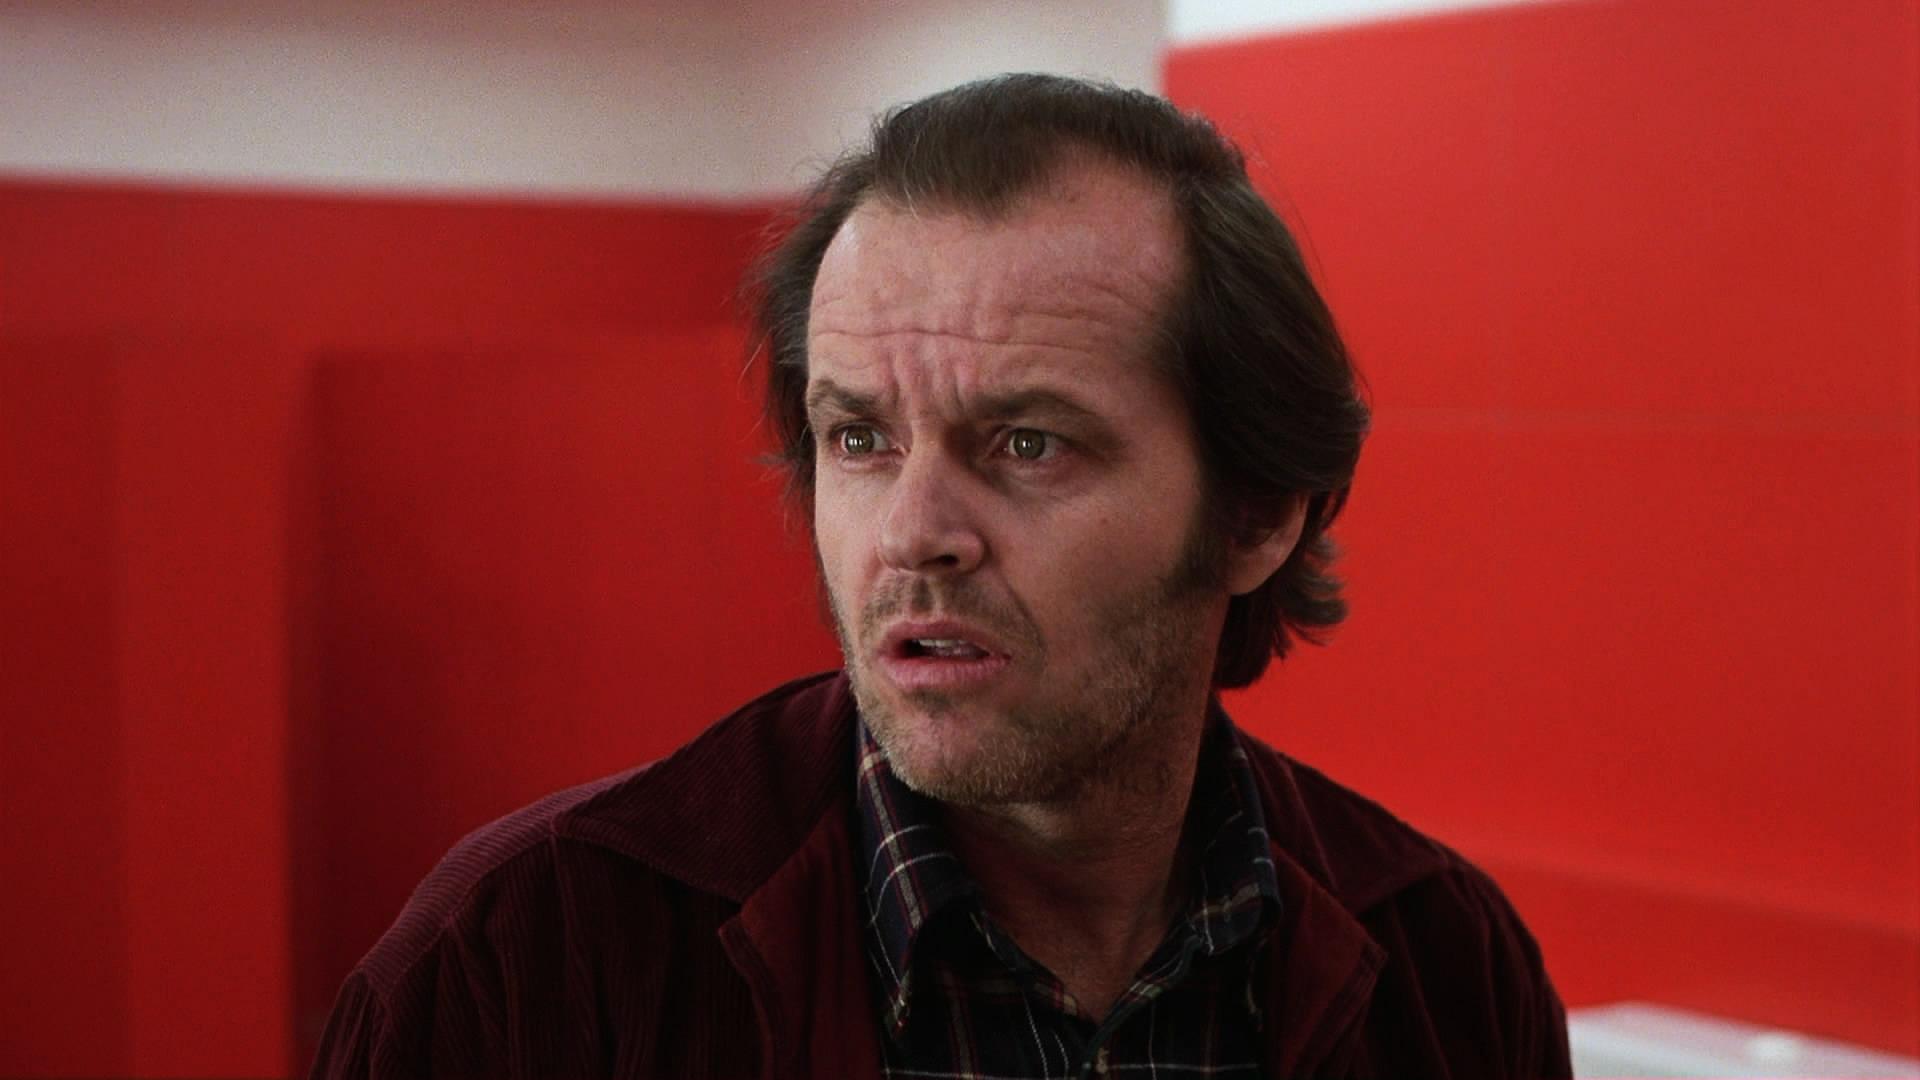 [38+] Jack Nicholson Shining Wallpaper on WallpaperSafari